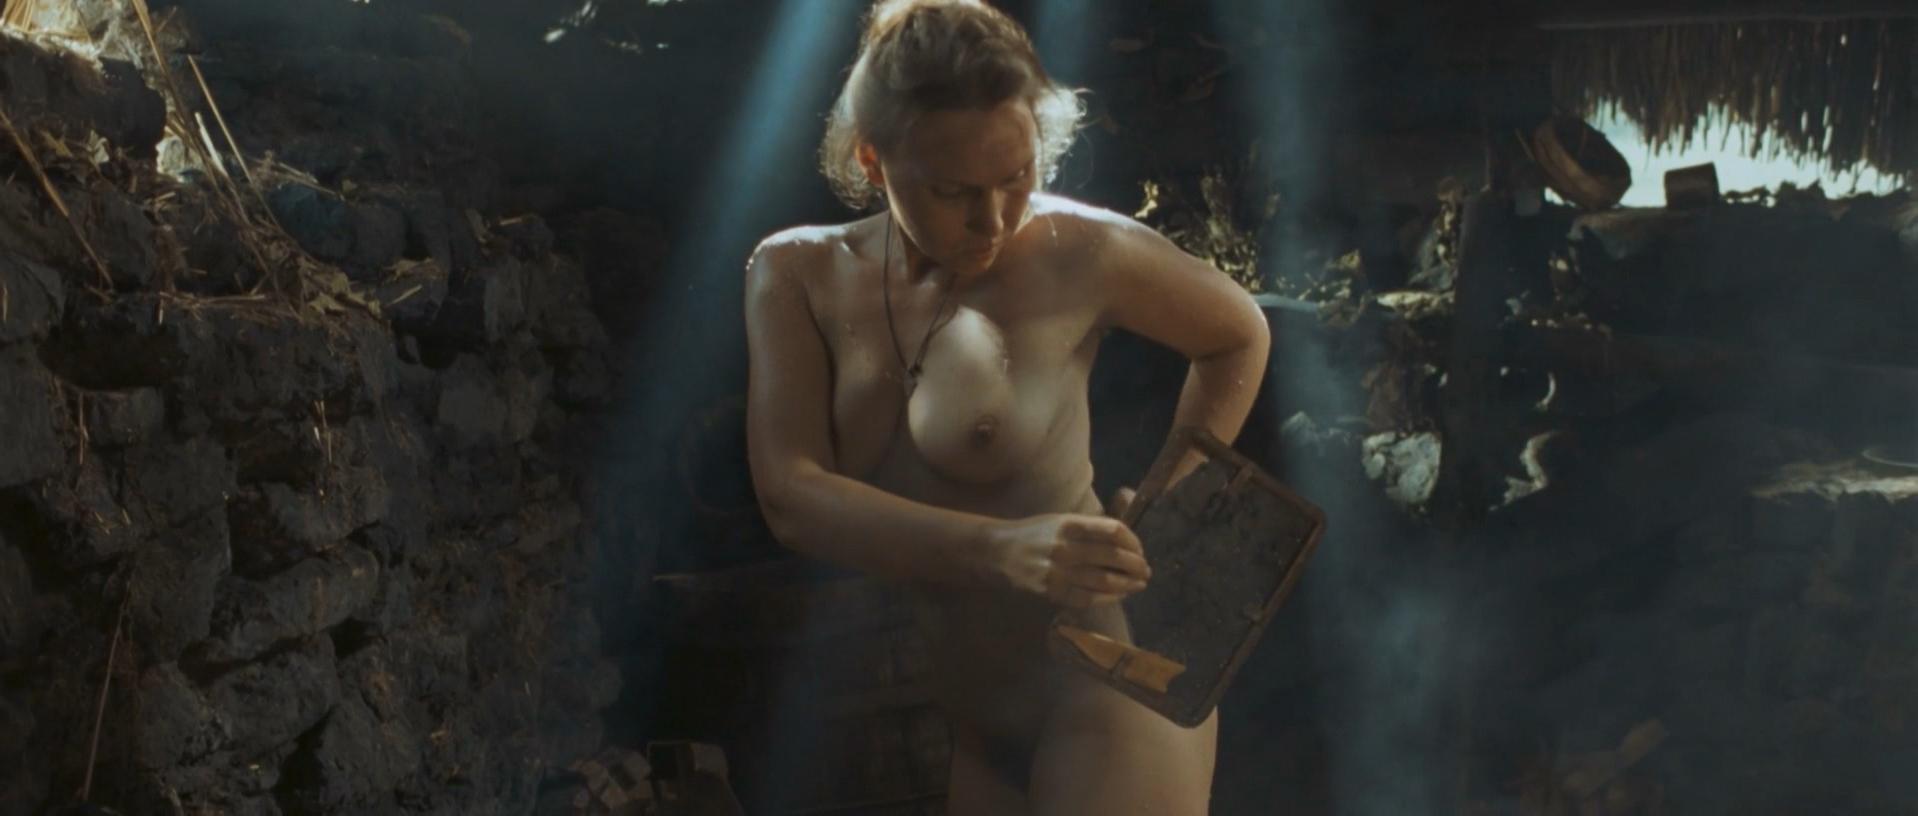 Darya Ekamasova nude - Zhila bila odna baba (2011)